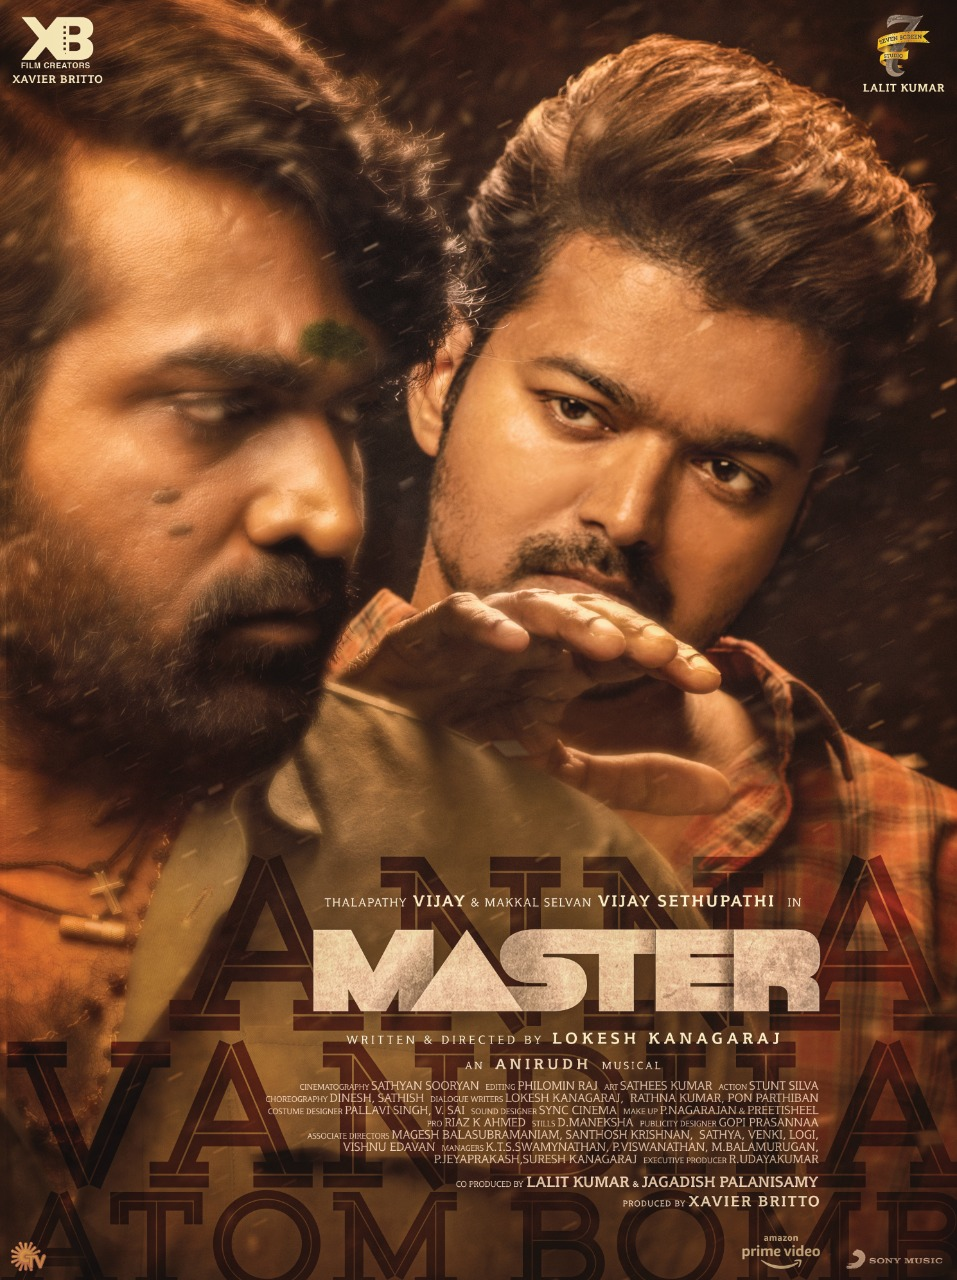 India's 'Master' Off To Commanding Box Office Start; Hindi Remake Set – Deadline